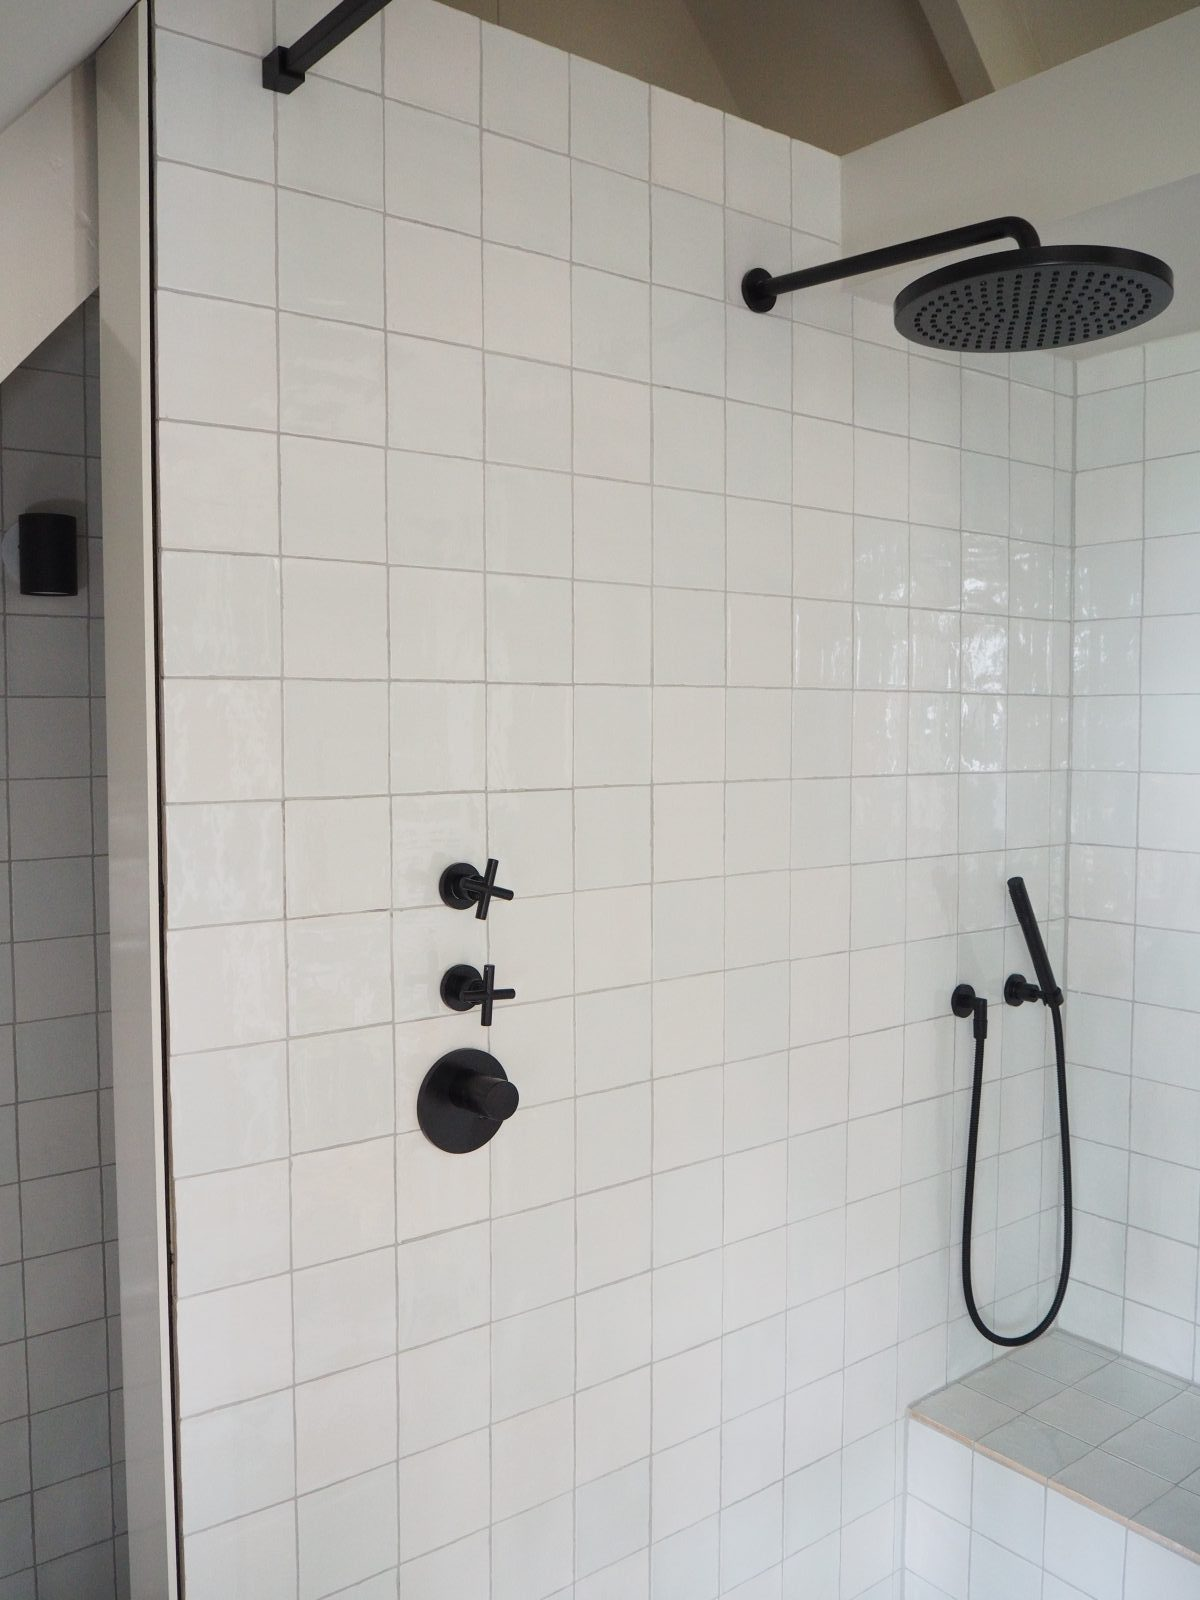 jeroen_de_nijs_wastafels_dornbracht_alape_welgelegen_boerderij_shower_tara